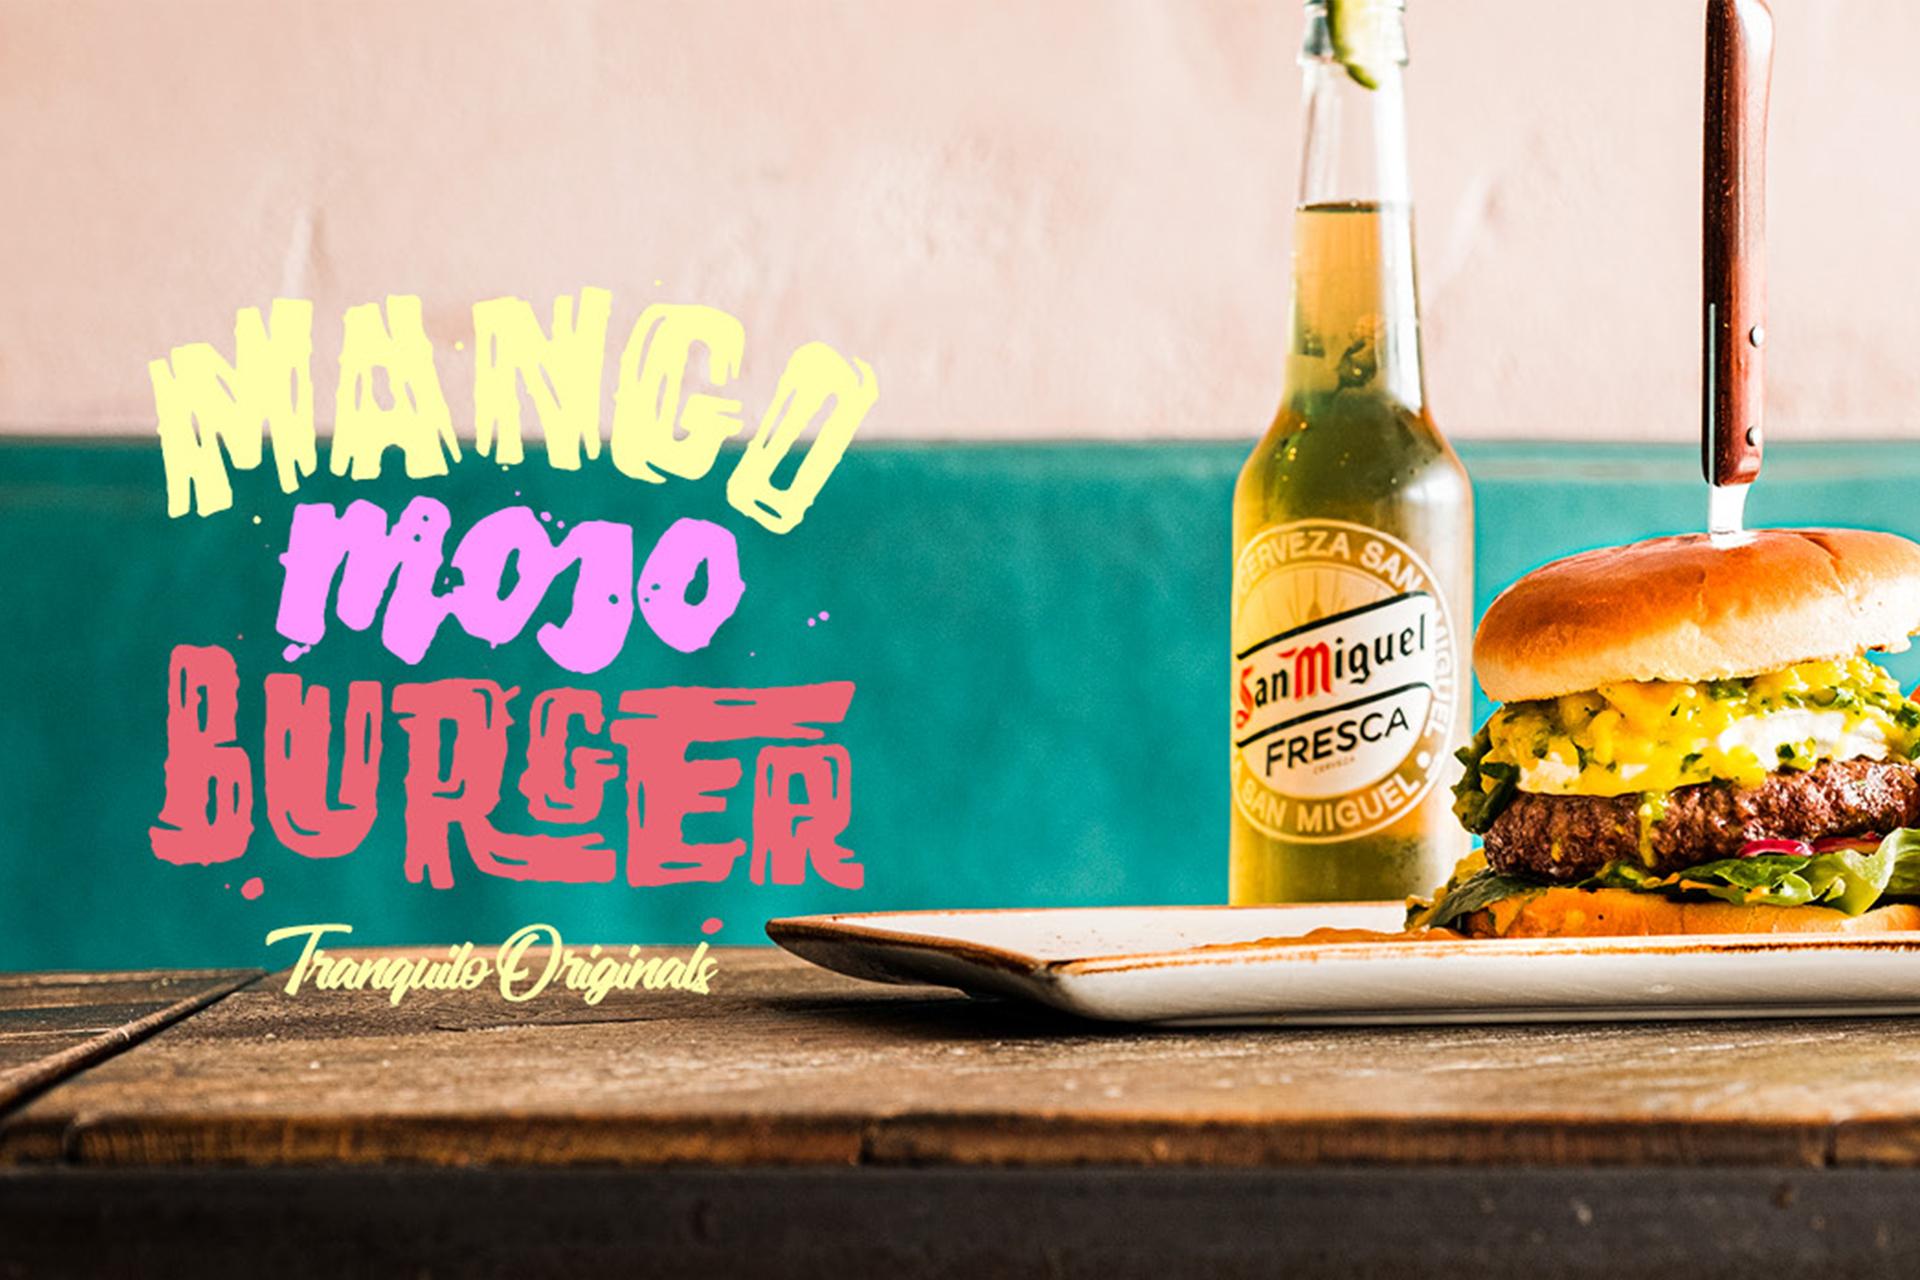 Tranquilo_Burger